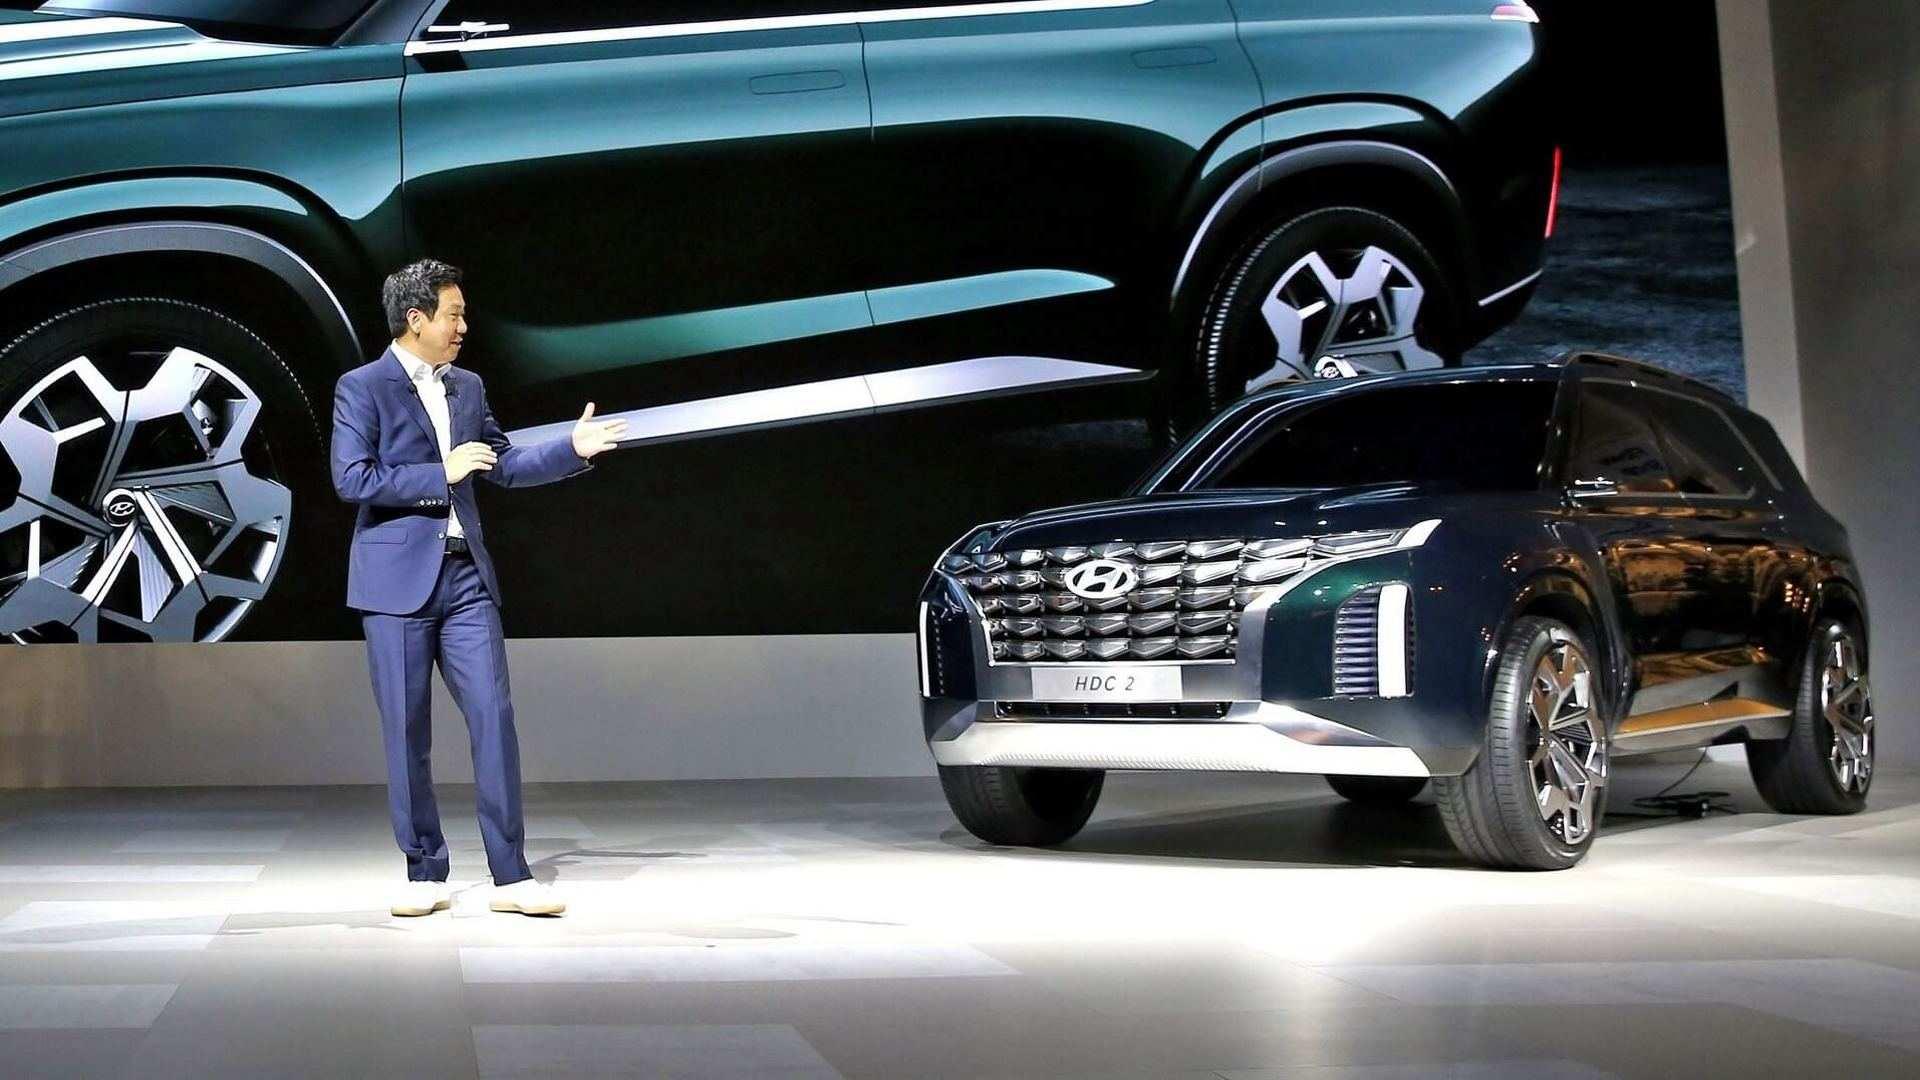 85 Best Review Hyundai Concept 2020 Spy Shoot with Hyundai Concept 2020